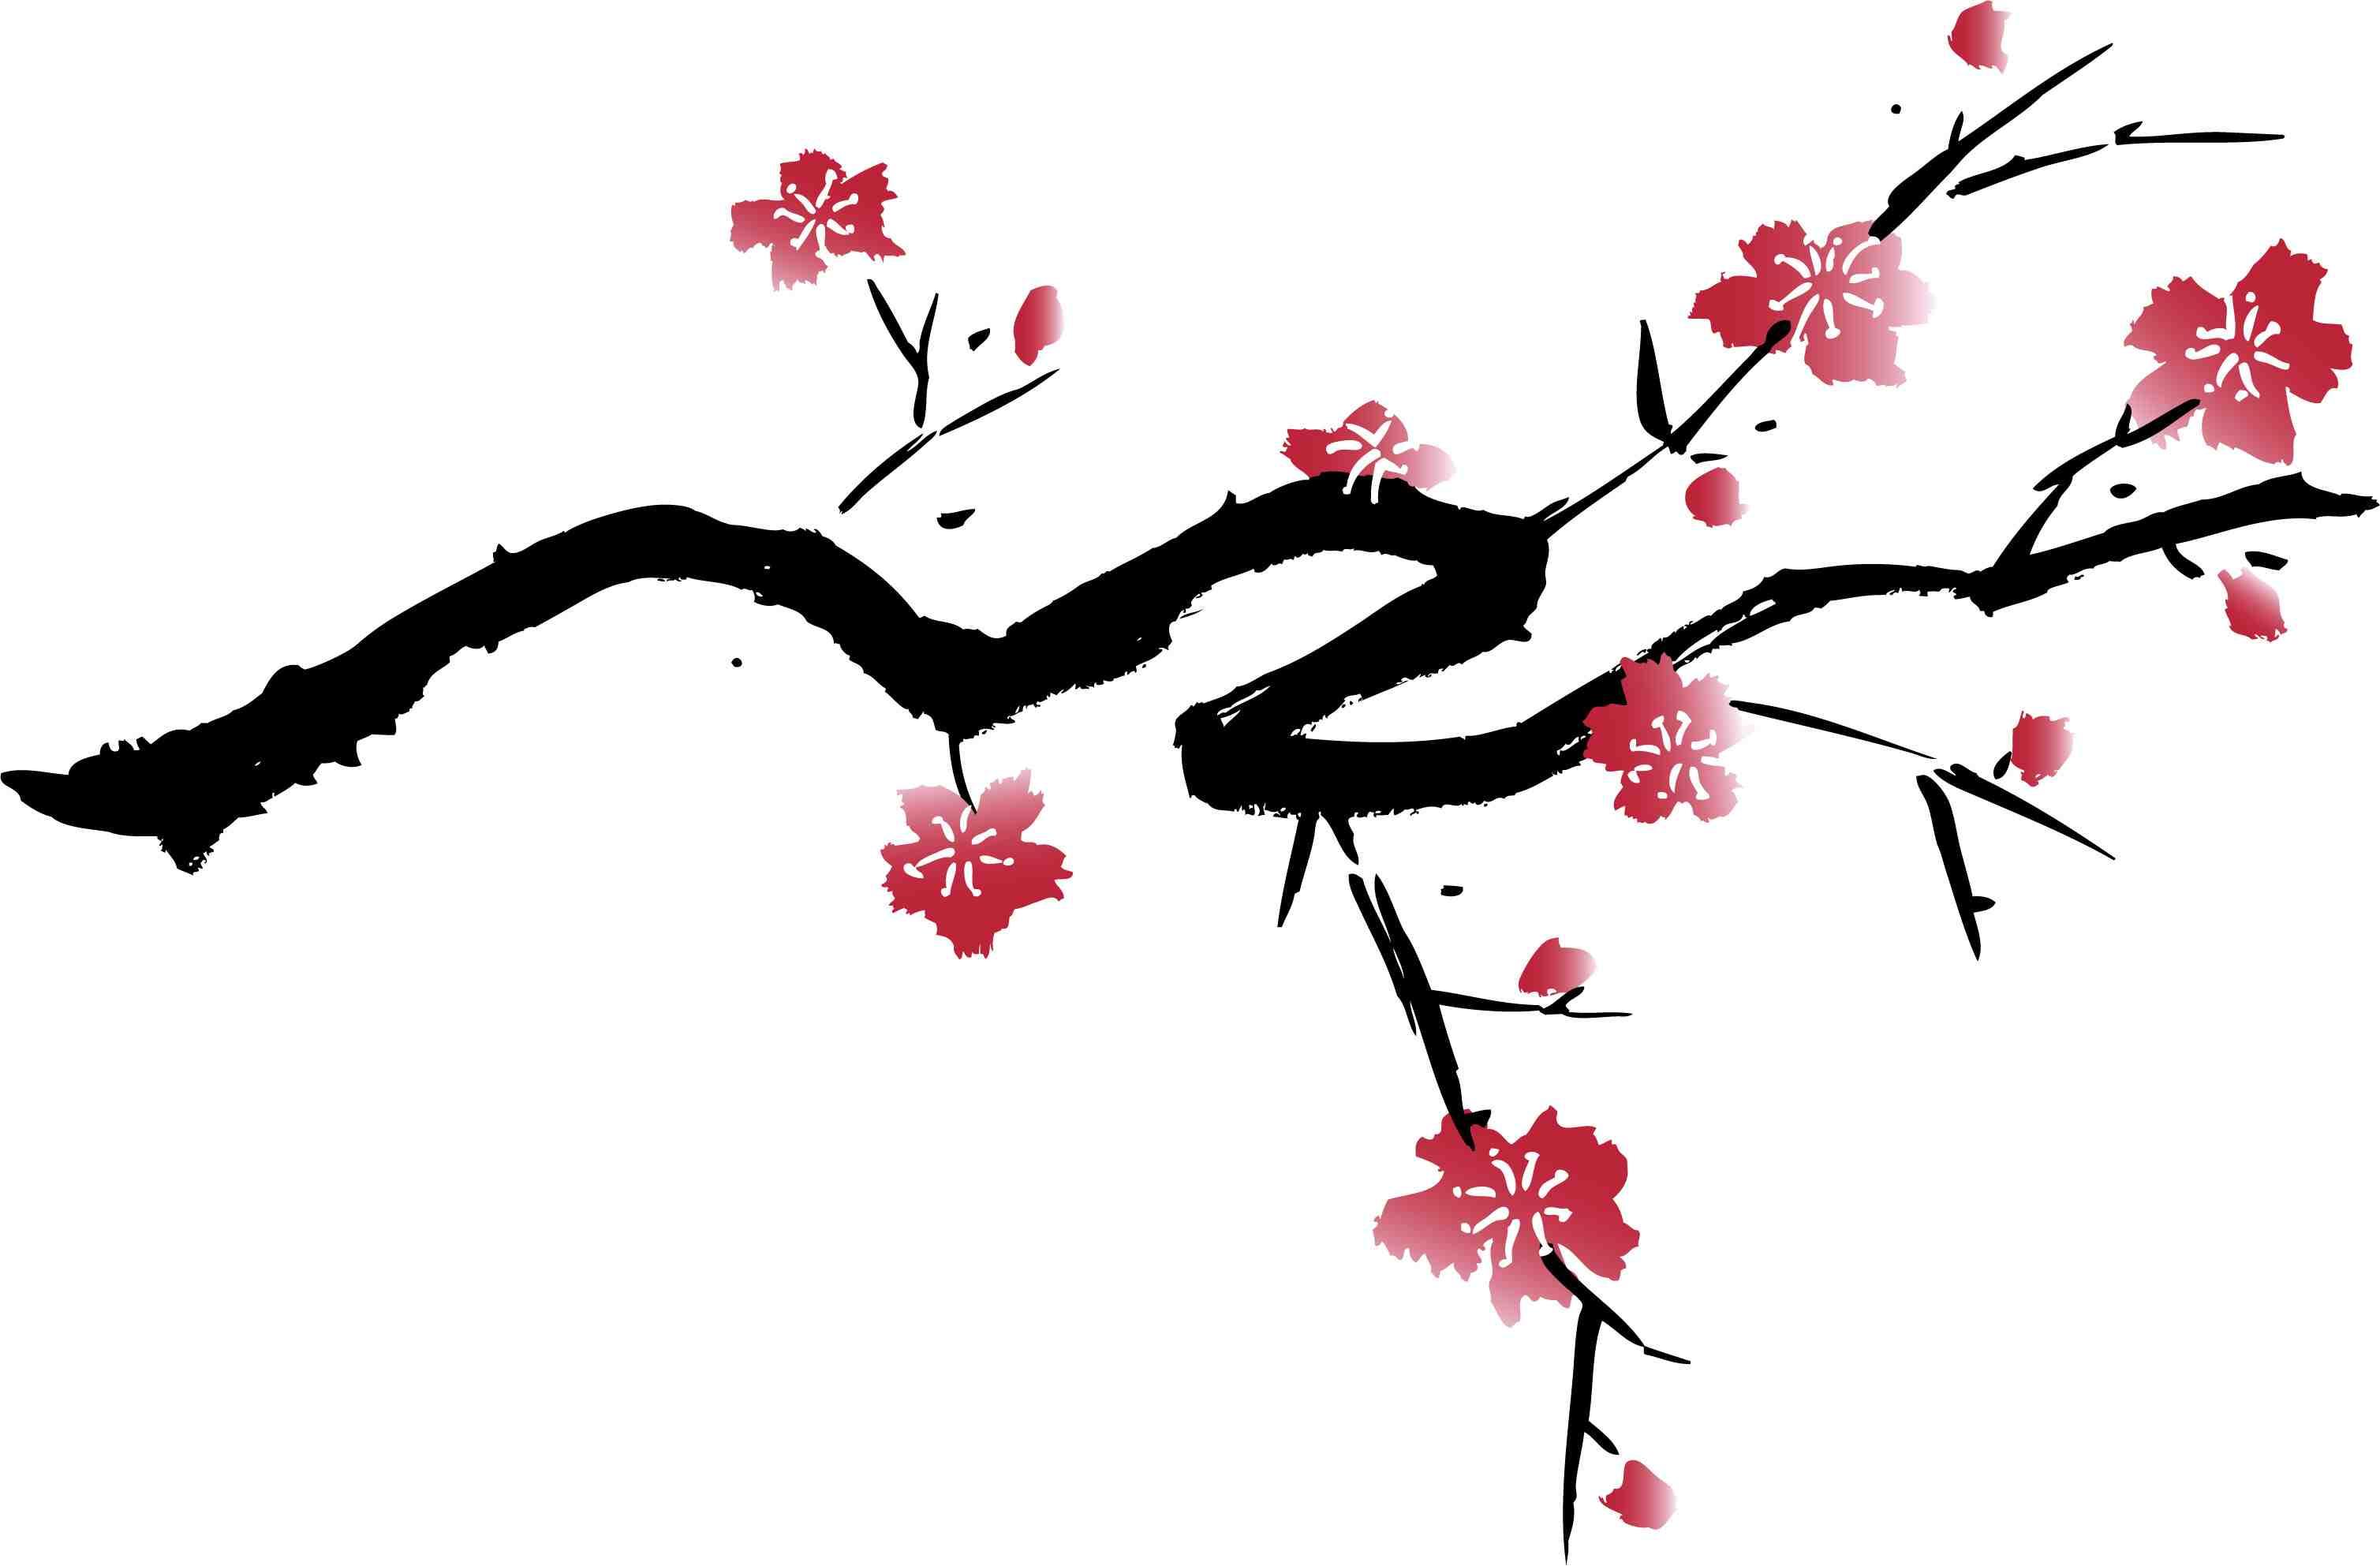 Drawn sakura blossom clip art Cherry Blossom ClipArt ClipArt Blossom